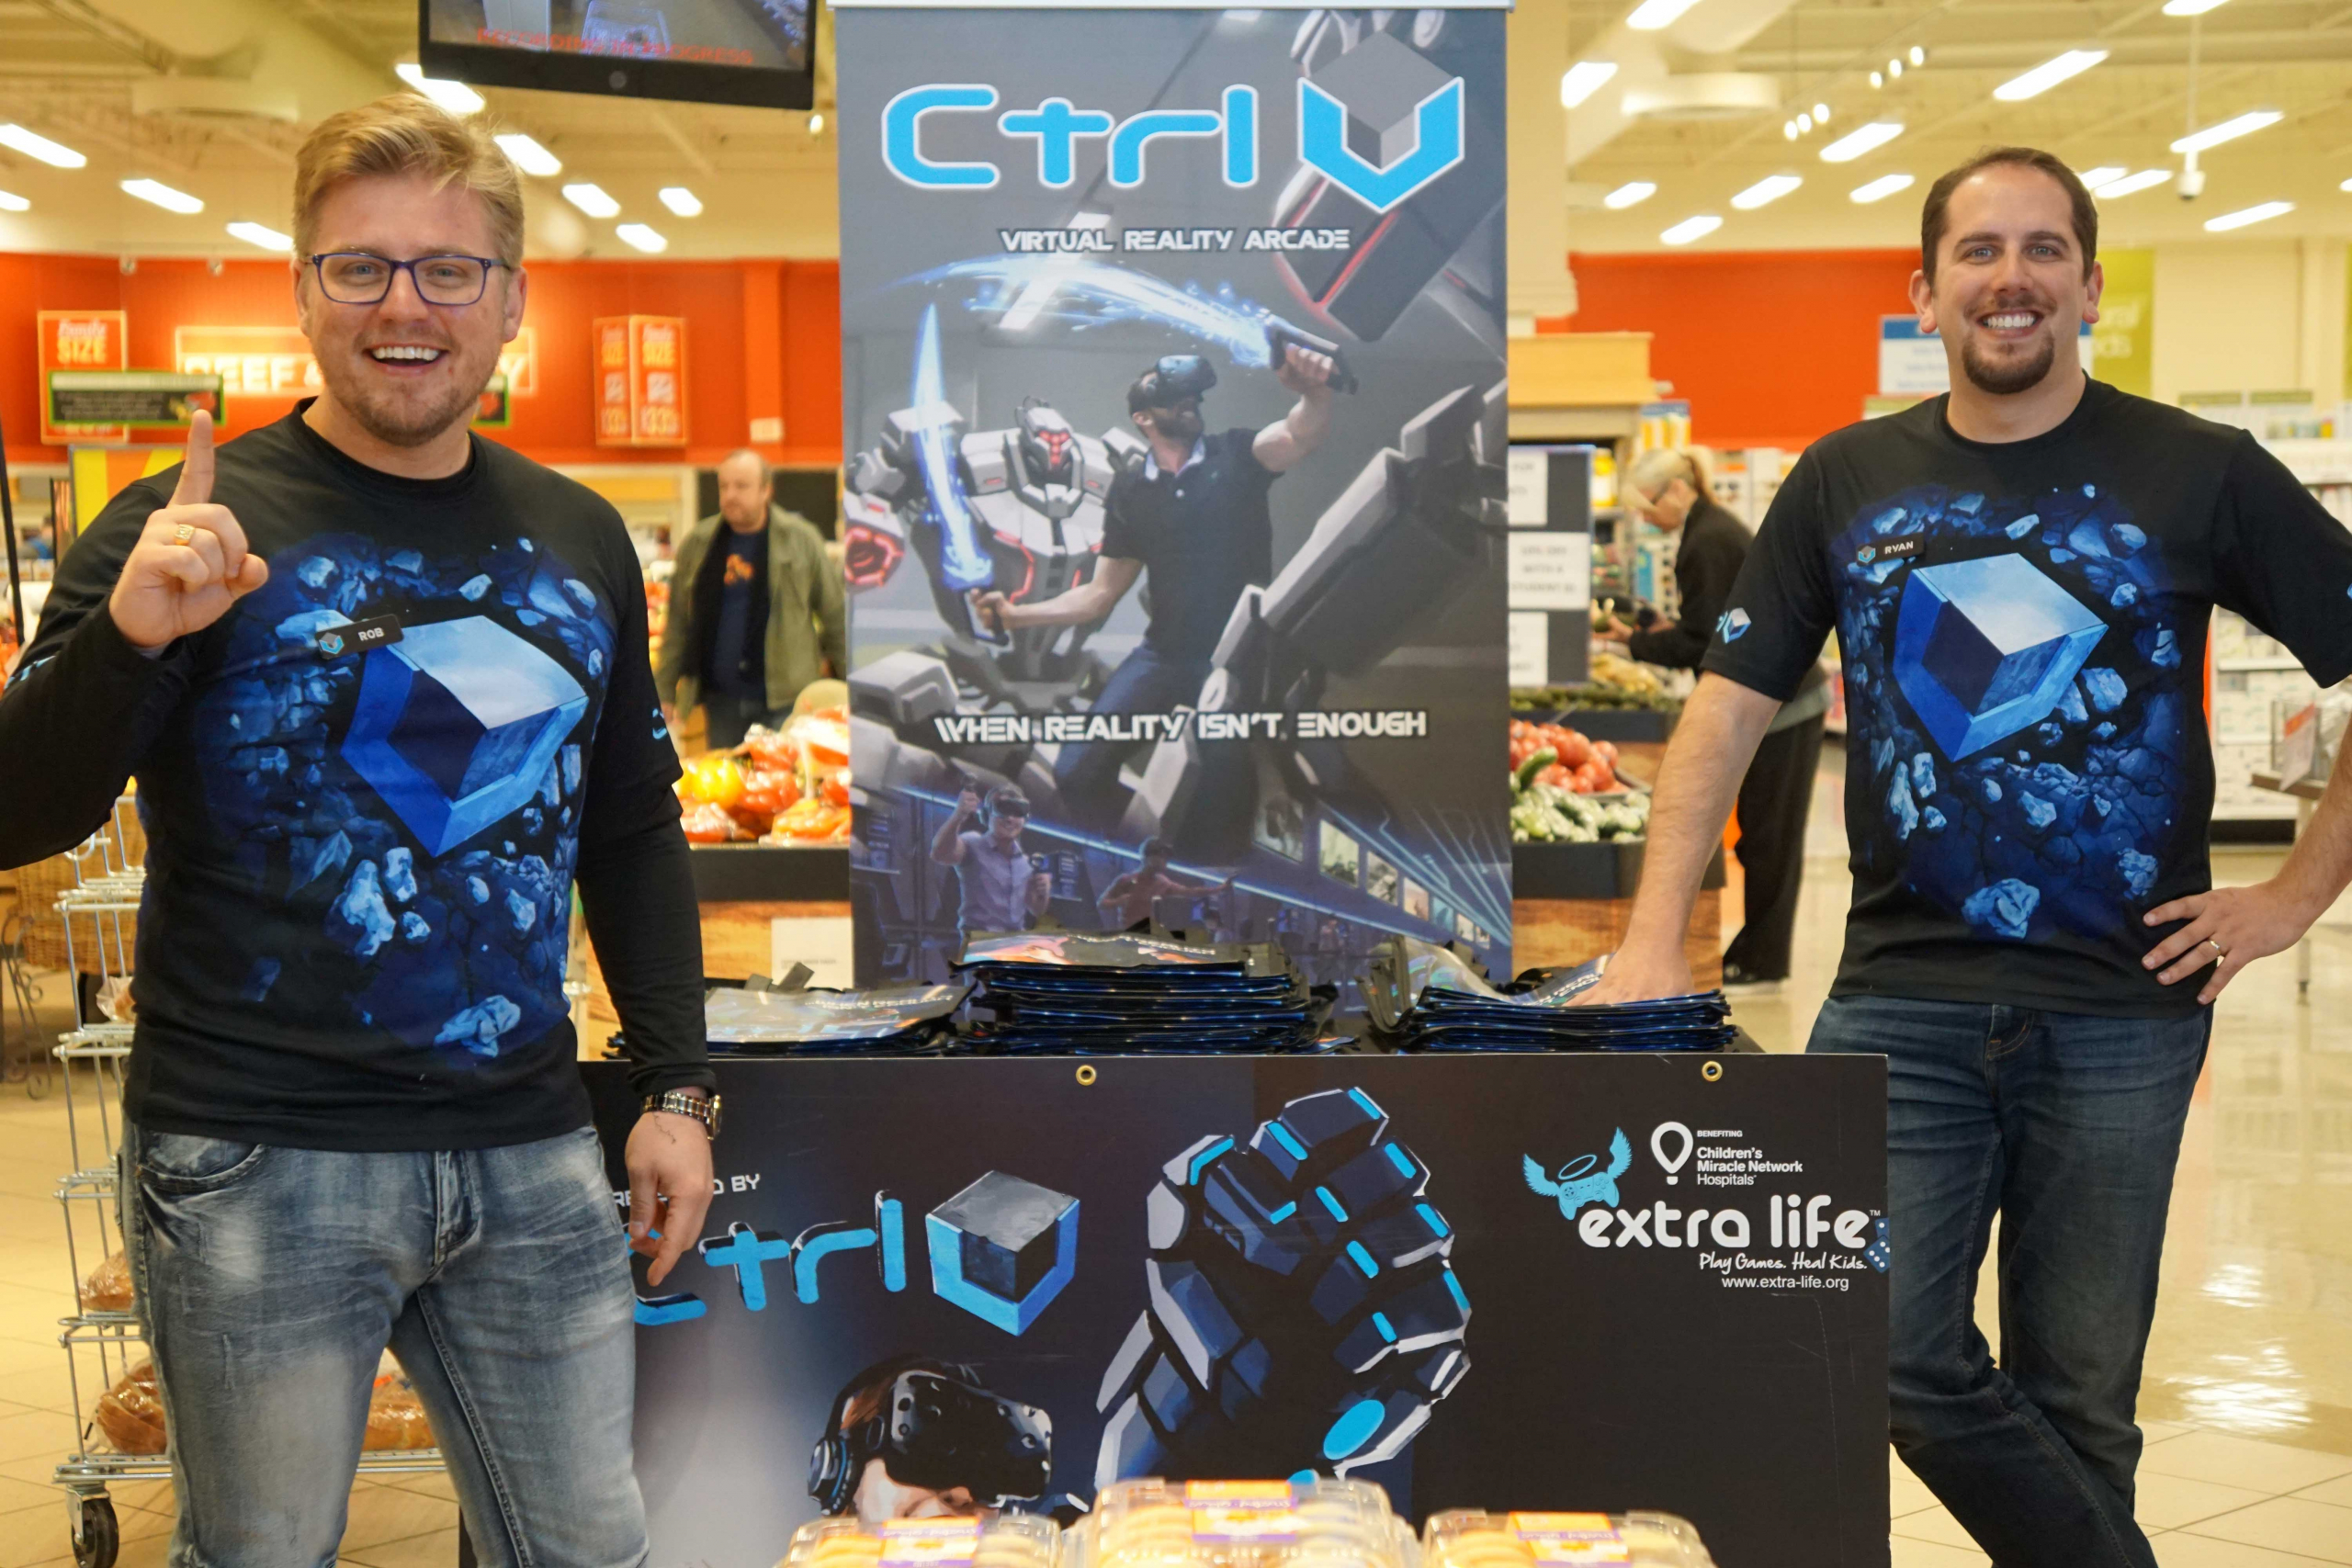 Ctrl V® Extra Life Grocery Bag Handout Robert Bruski & Ryan Brooks